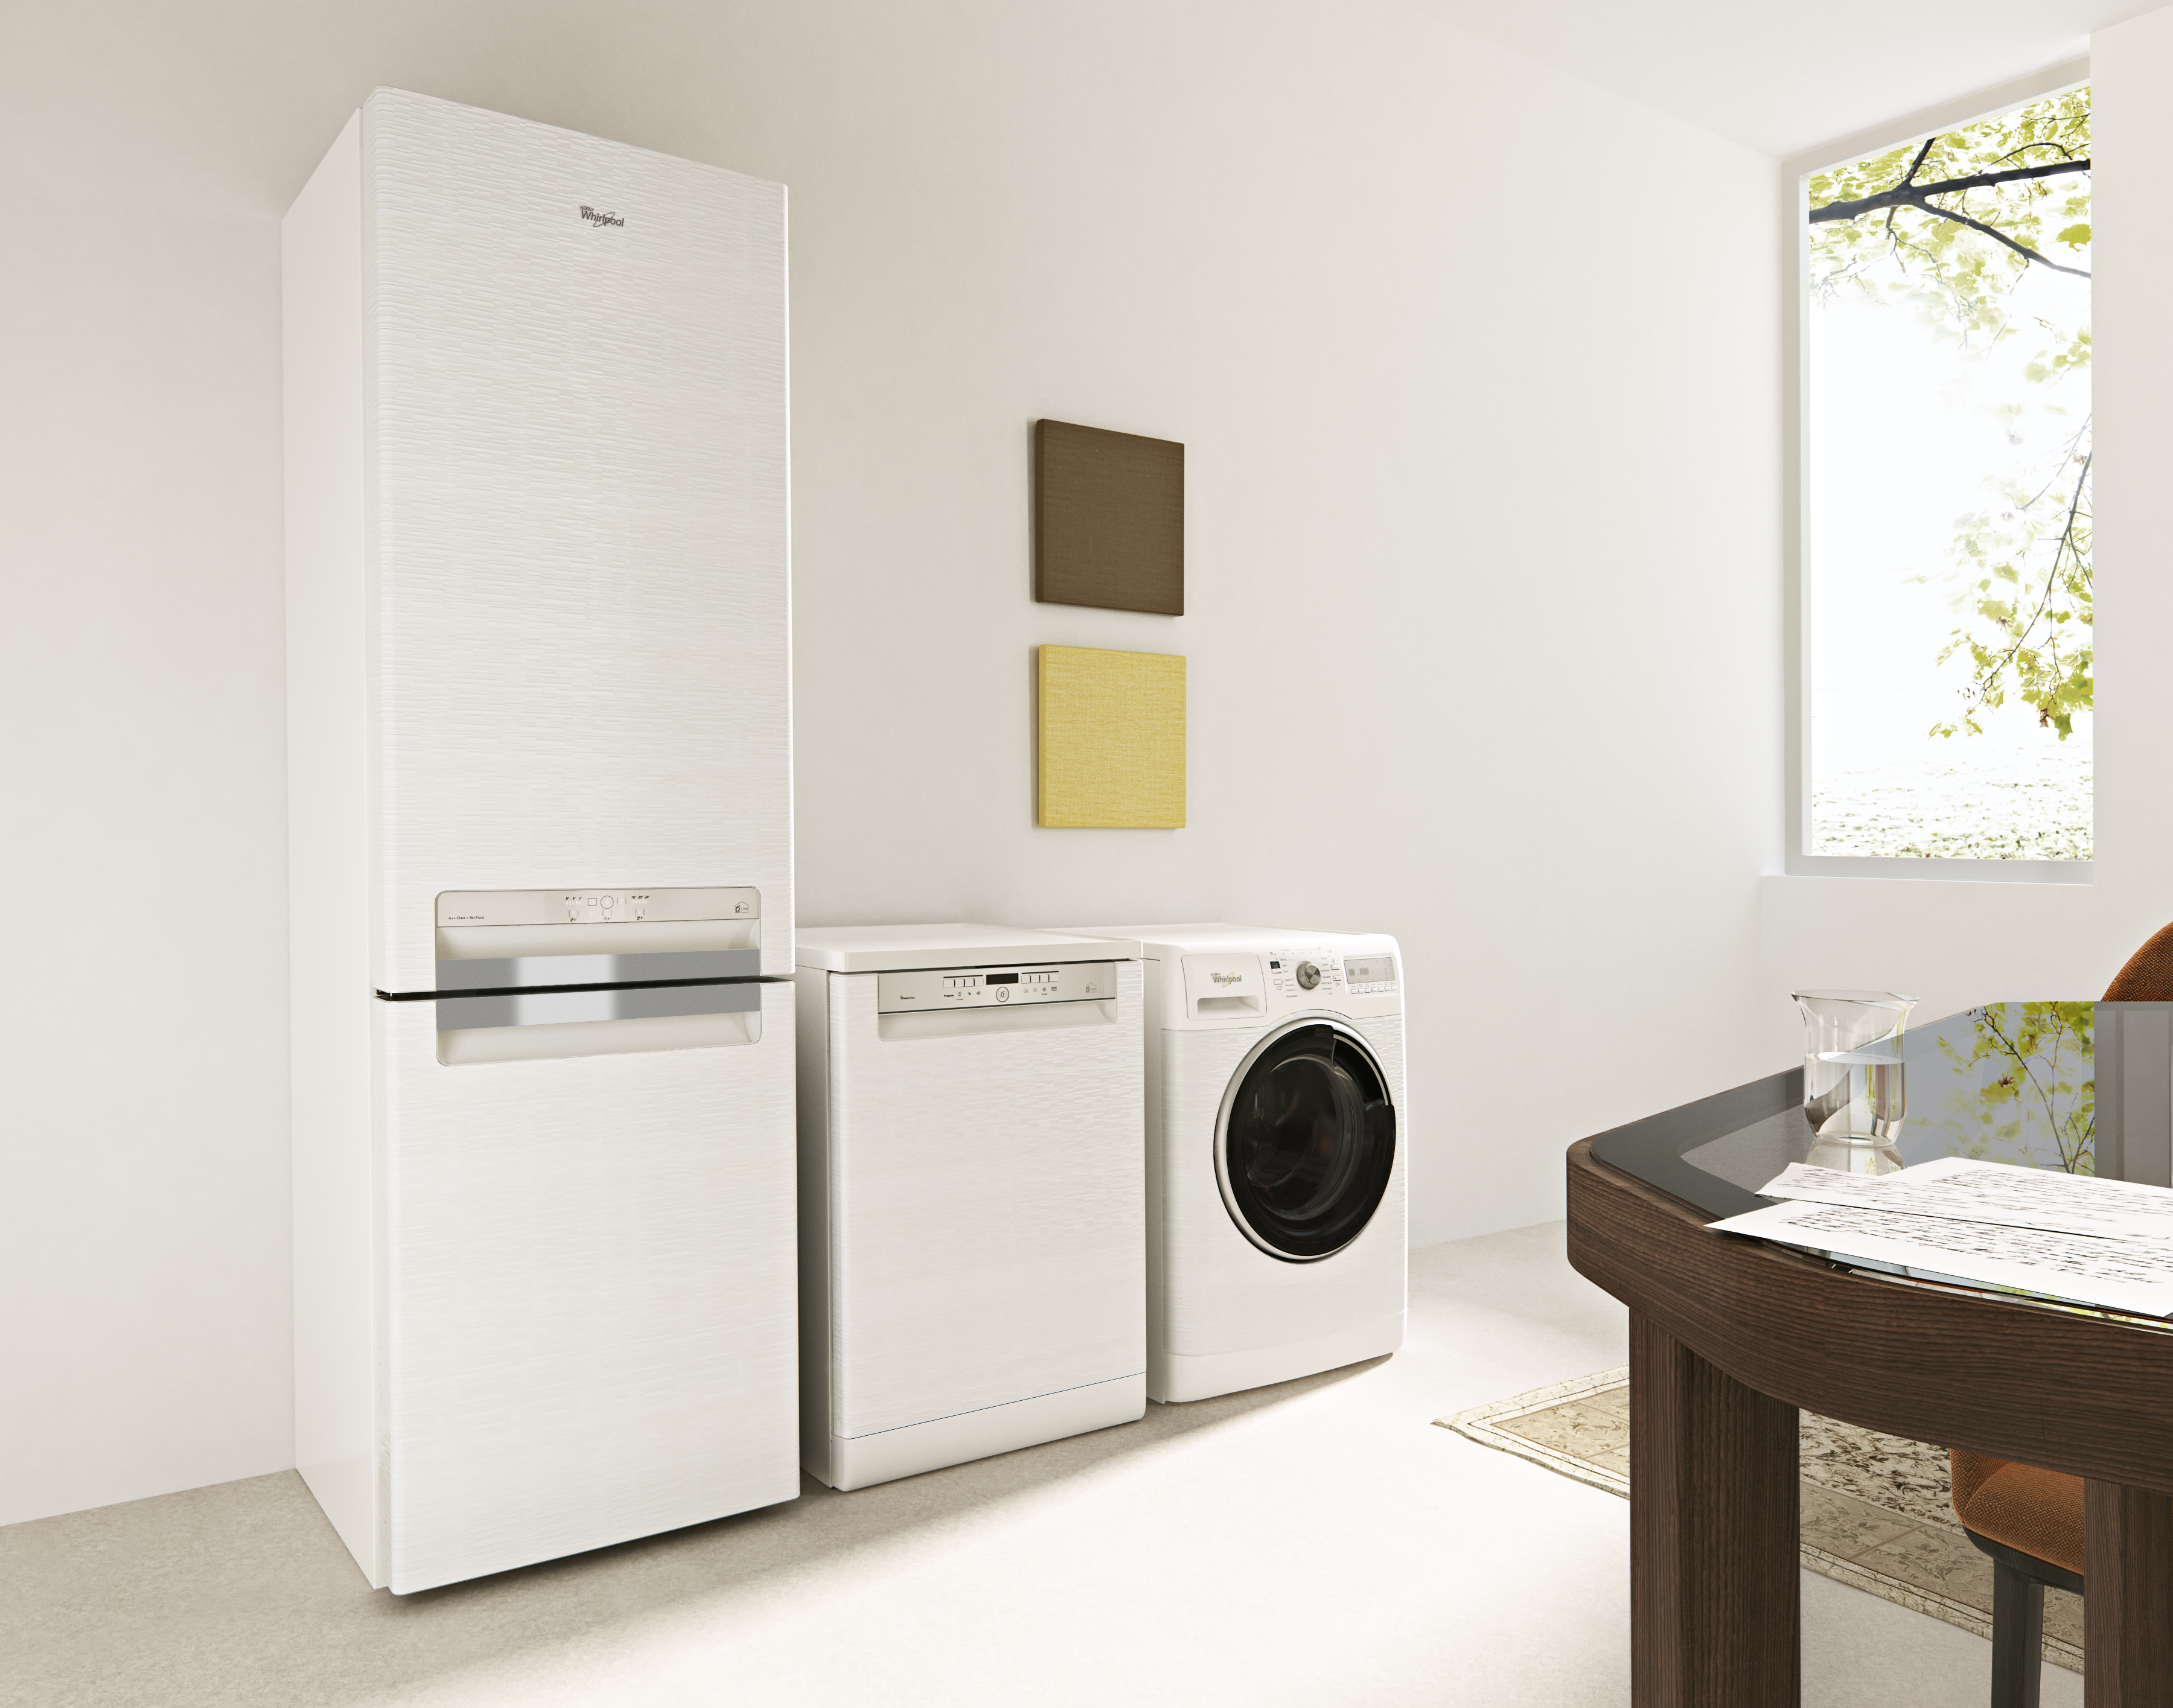 6 me sens live whirlpool d voile sa gamme d 39 appareils connect s de whirlpool. Black Bedroom Furniture Sets. Home Design Ideas